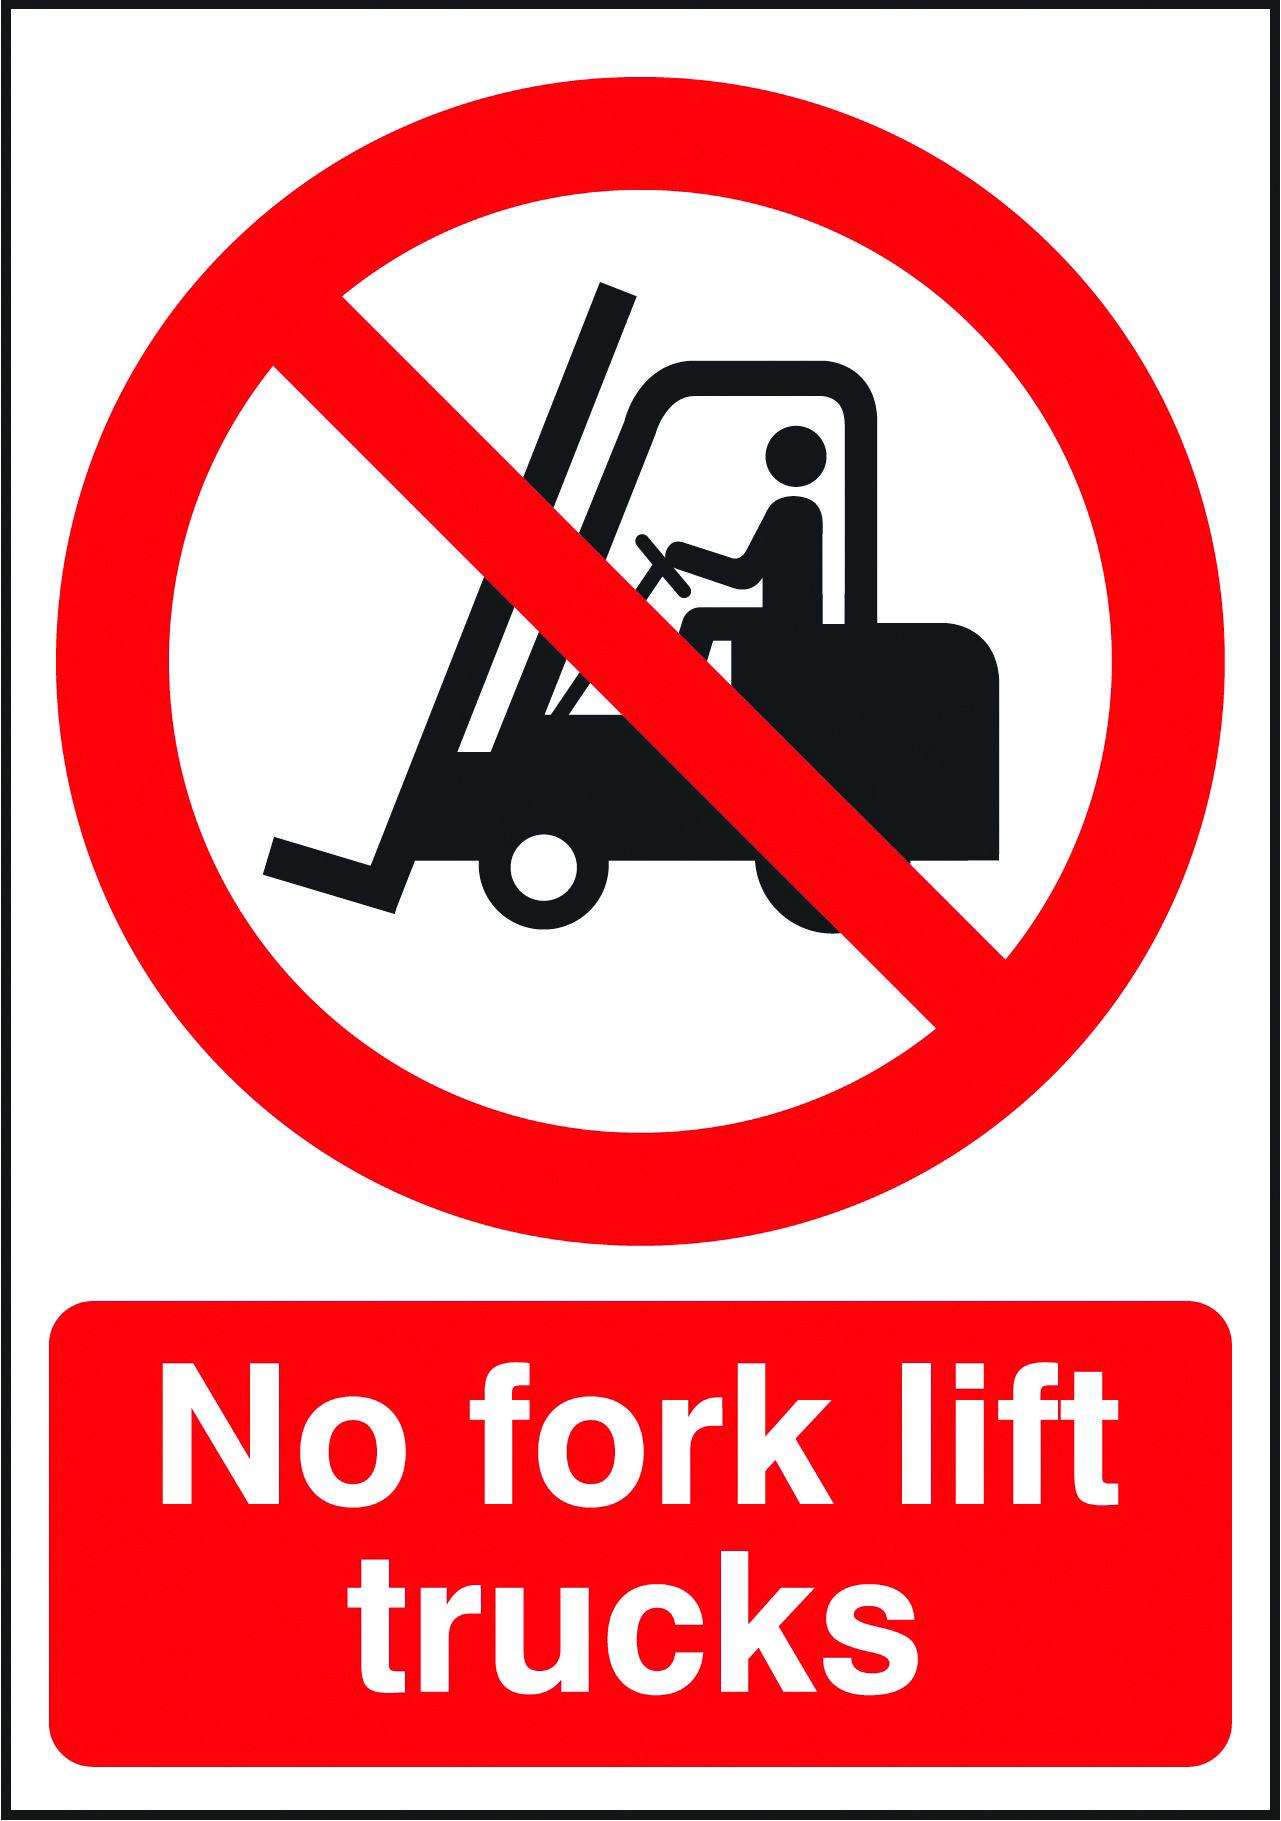 No fork lift trucks sign Beaverswood Identification Solutions